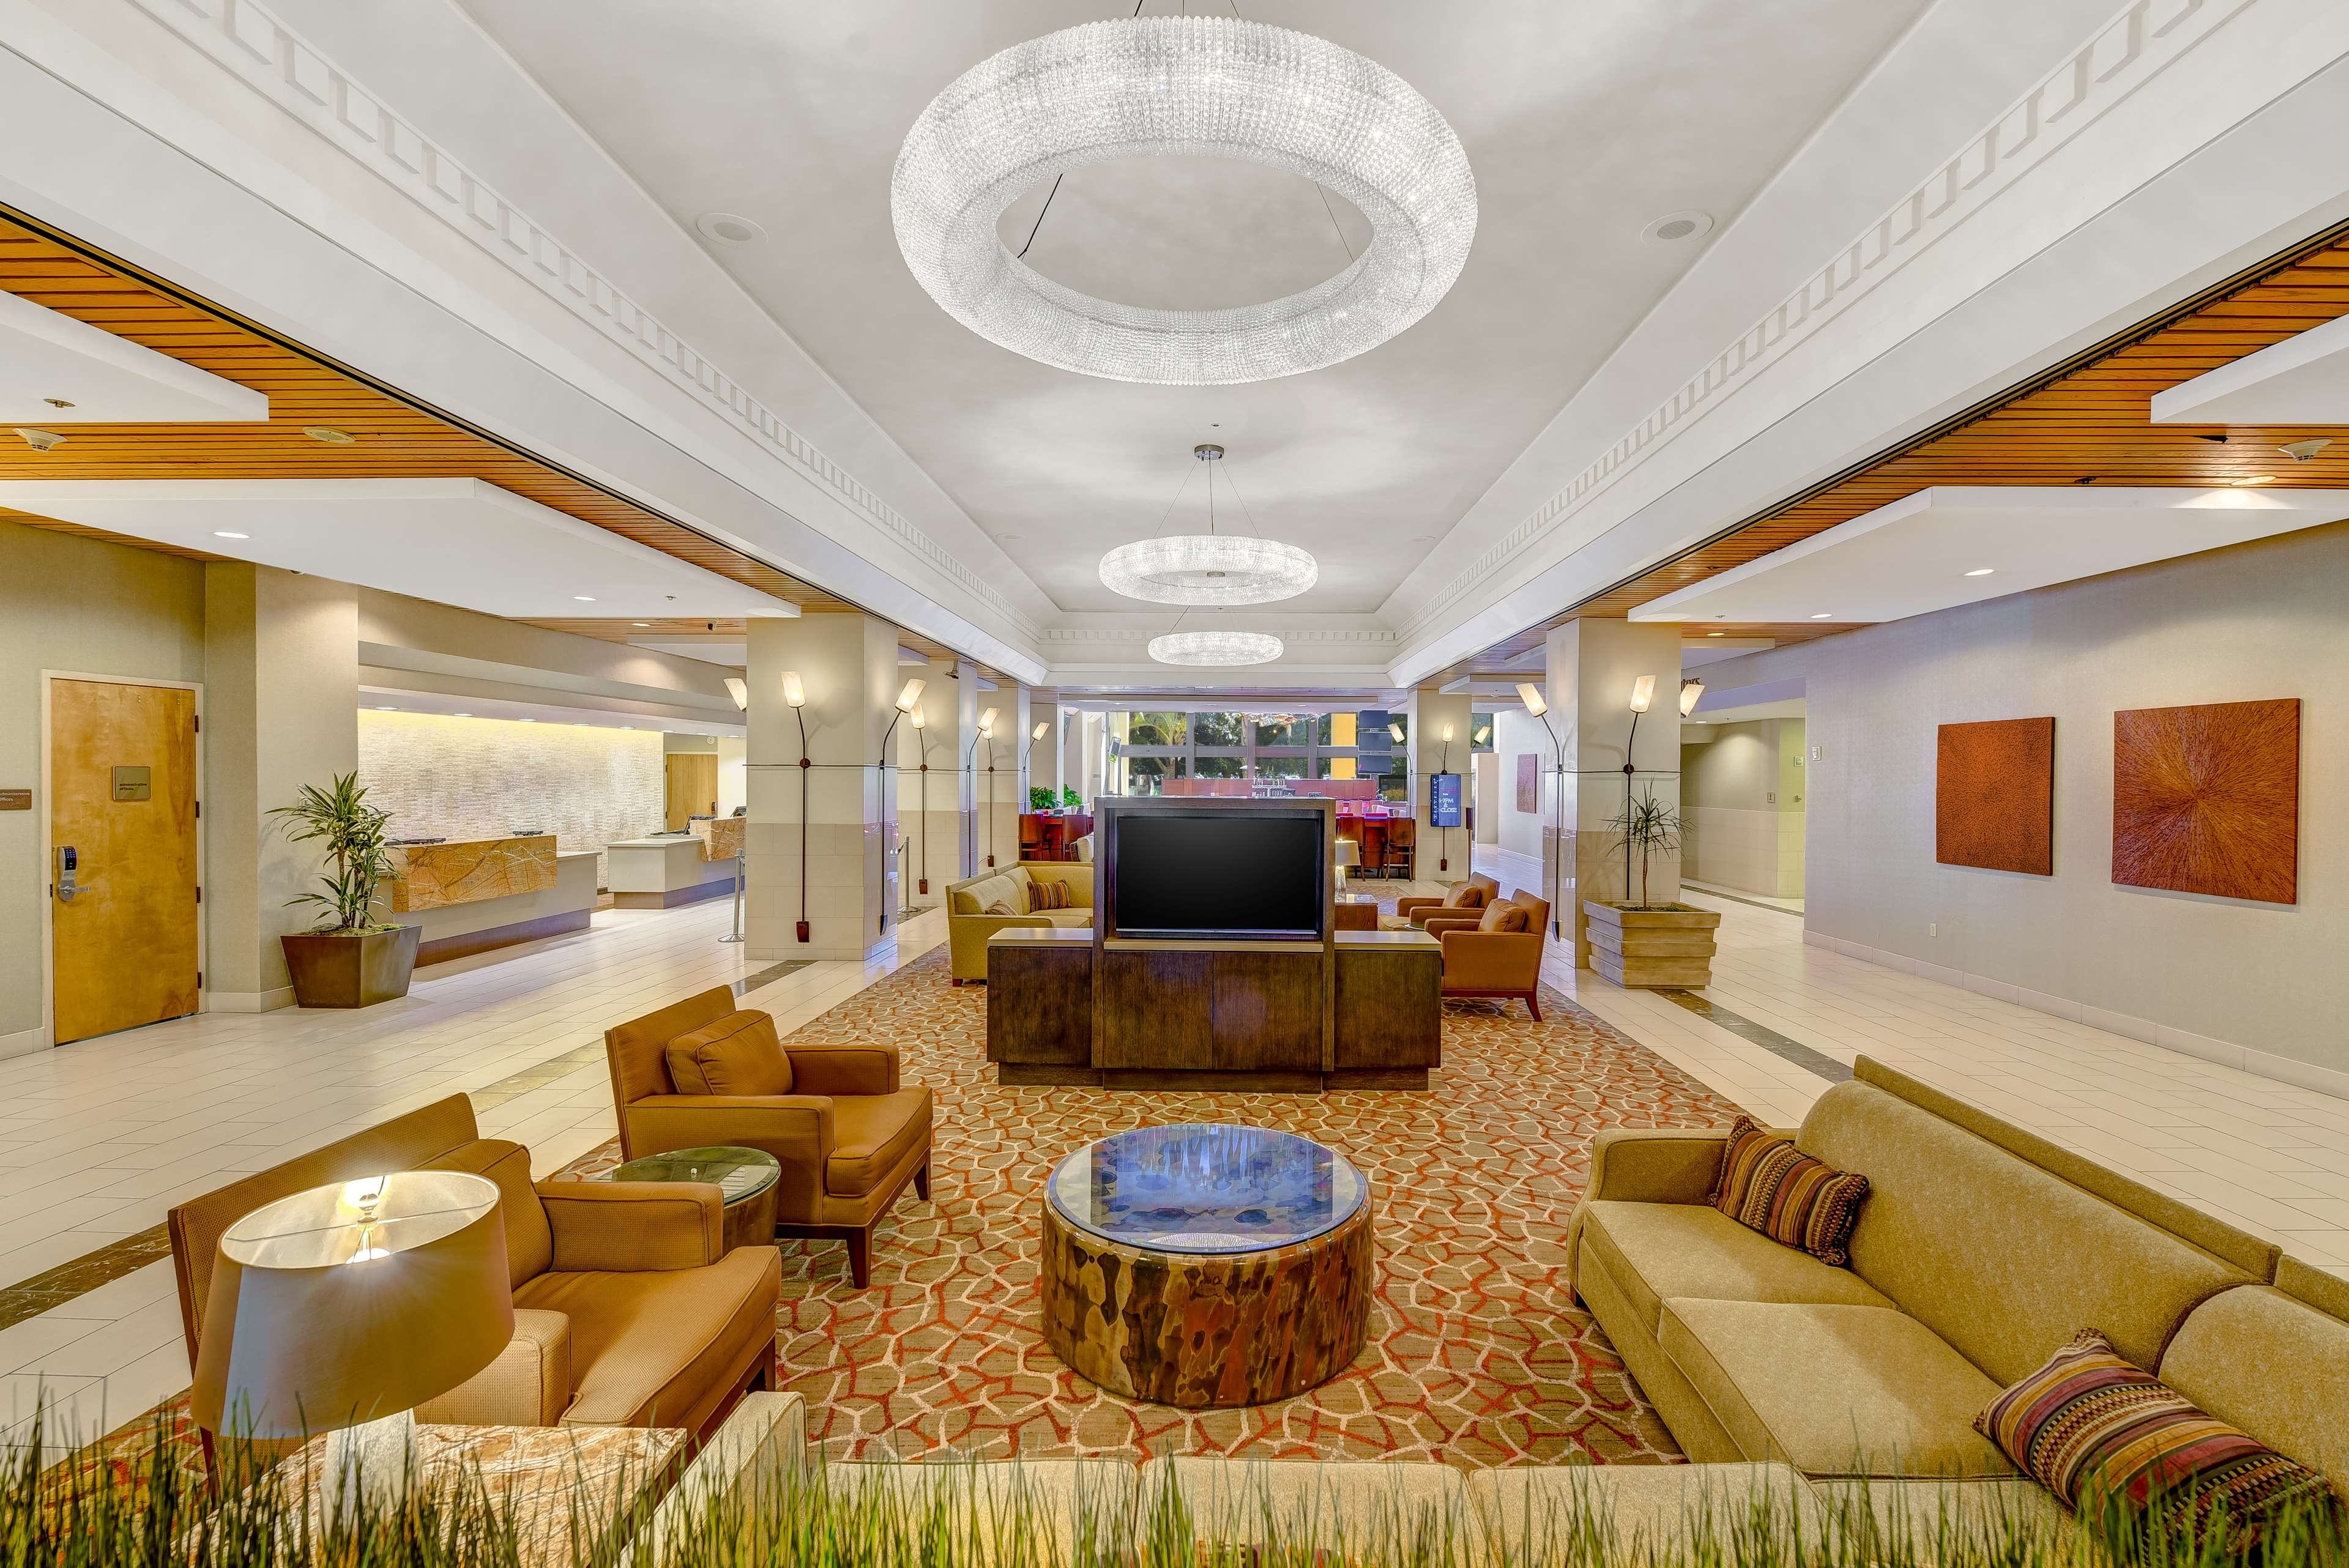 DoubleTree by Hilton Hotel Anaheim - Orange County image 16